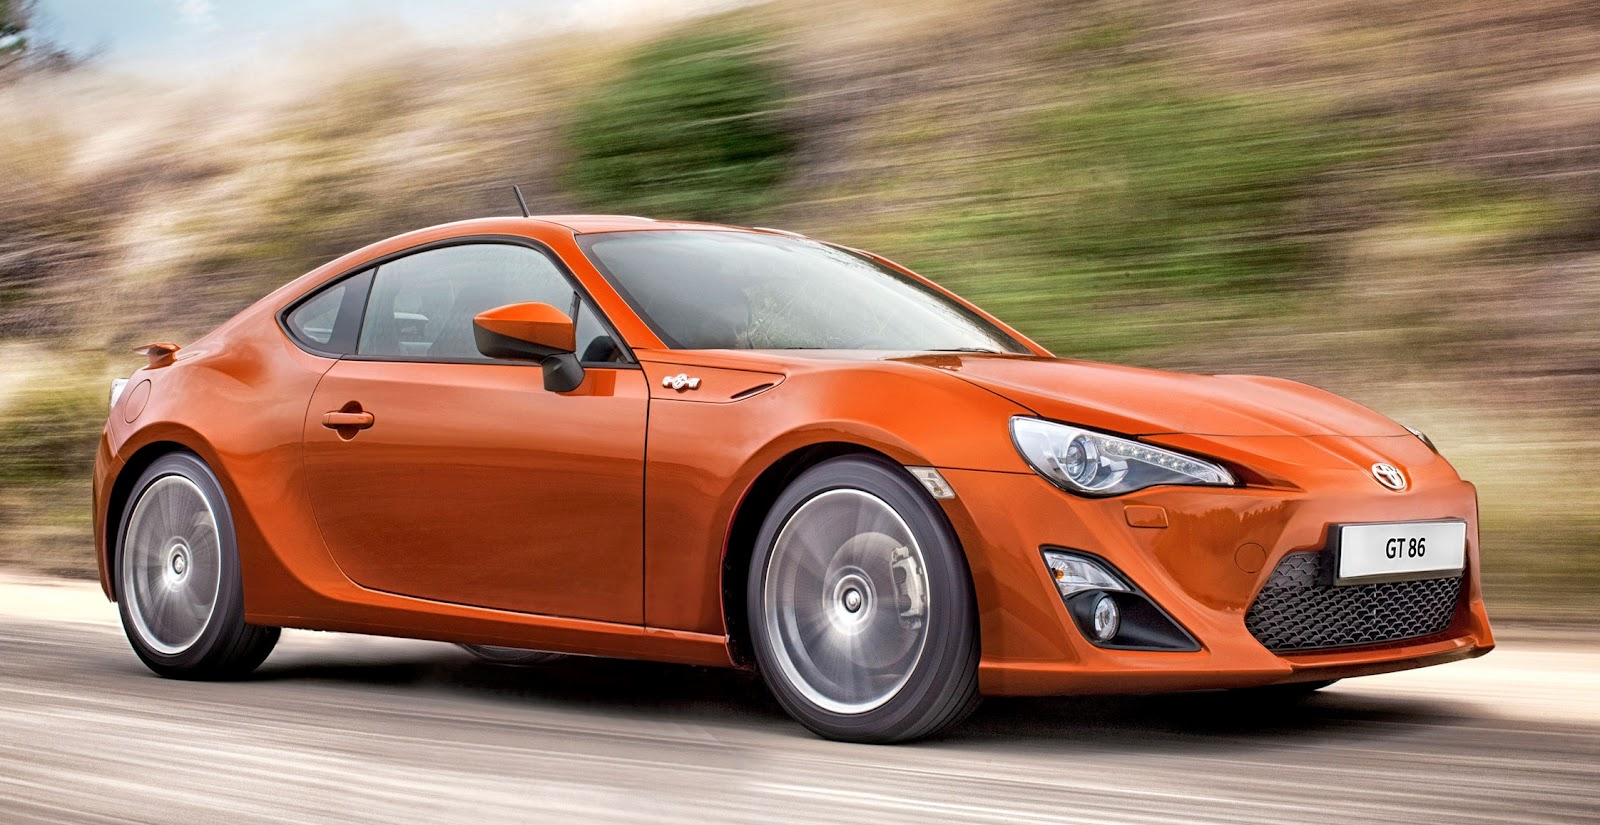 toyota yaris trd 2014 harga grand new avanza bahan bakar jual beli jakarta: launching ...